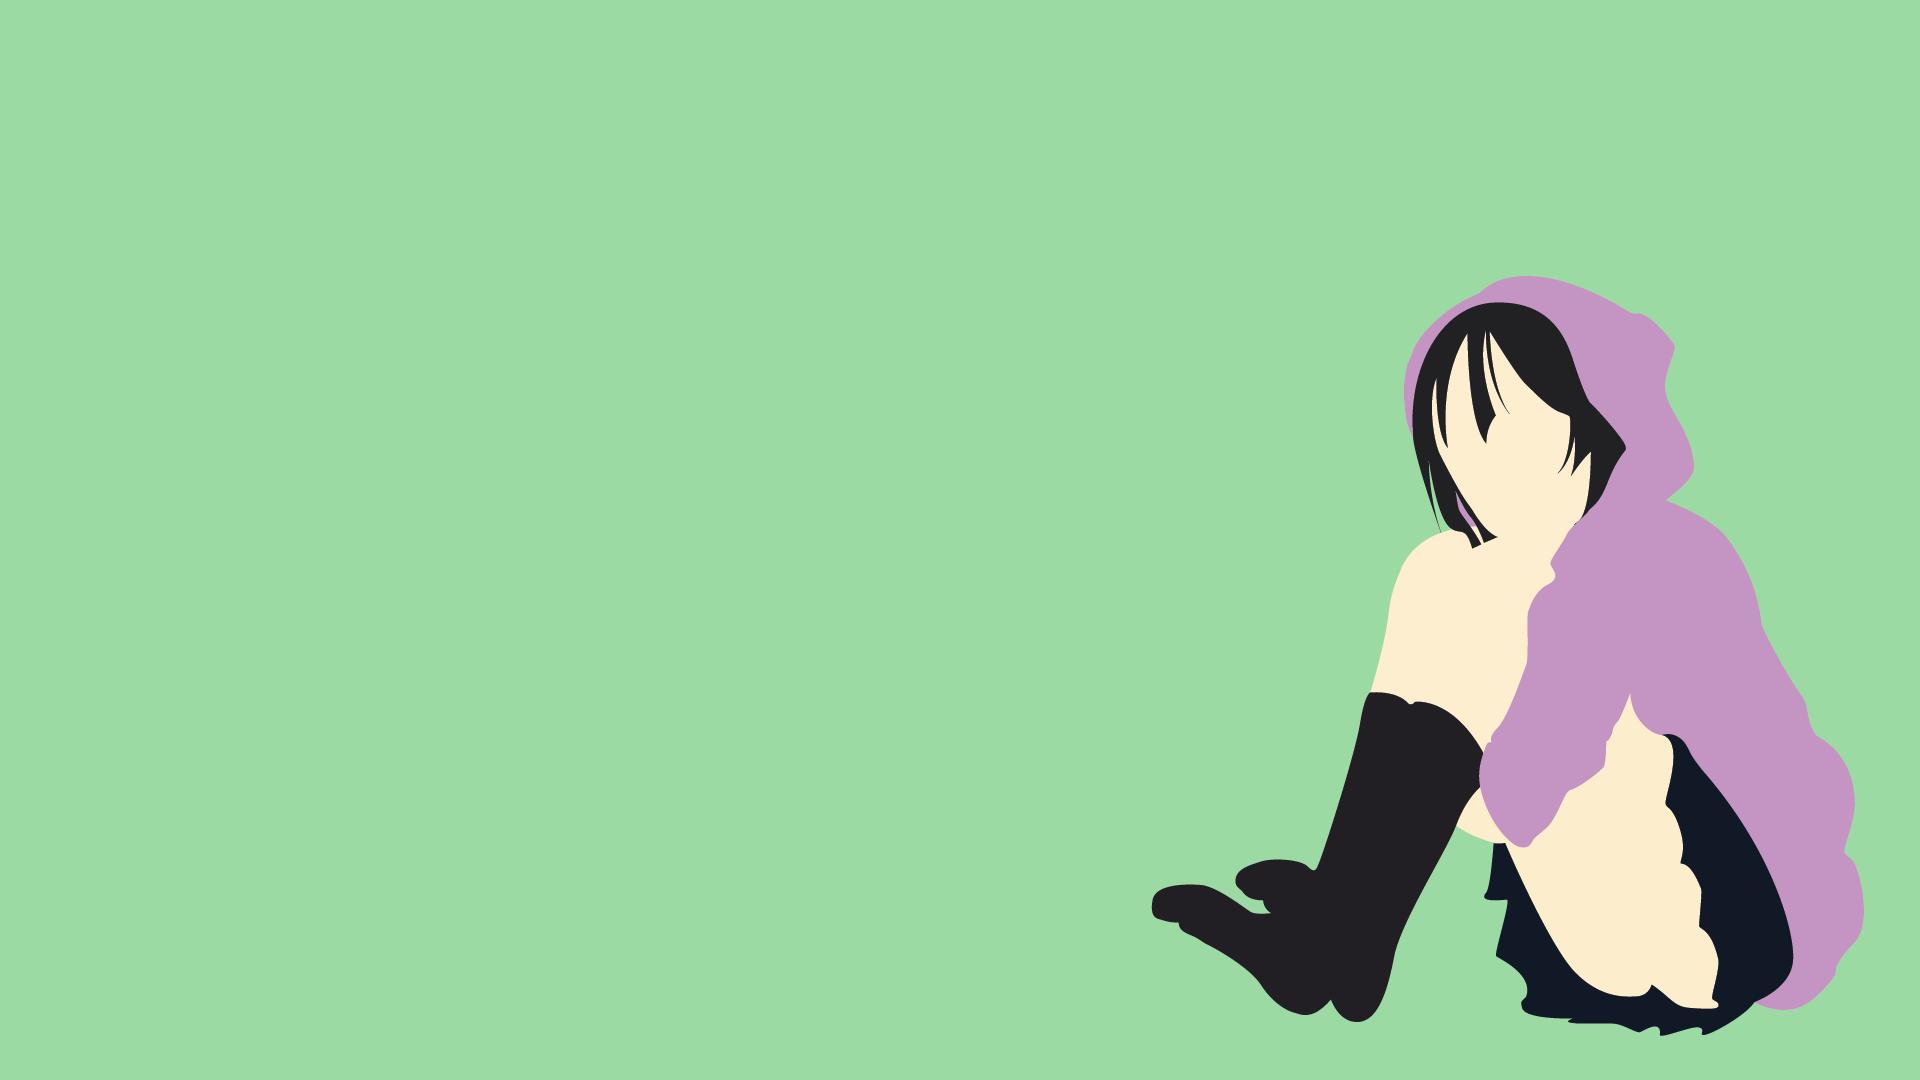 Anime 1920x1080 anime vectors anime girls